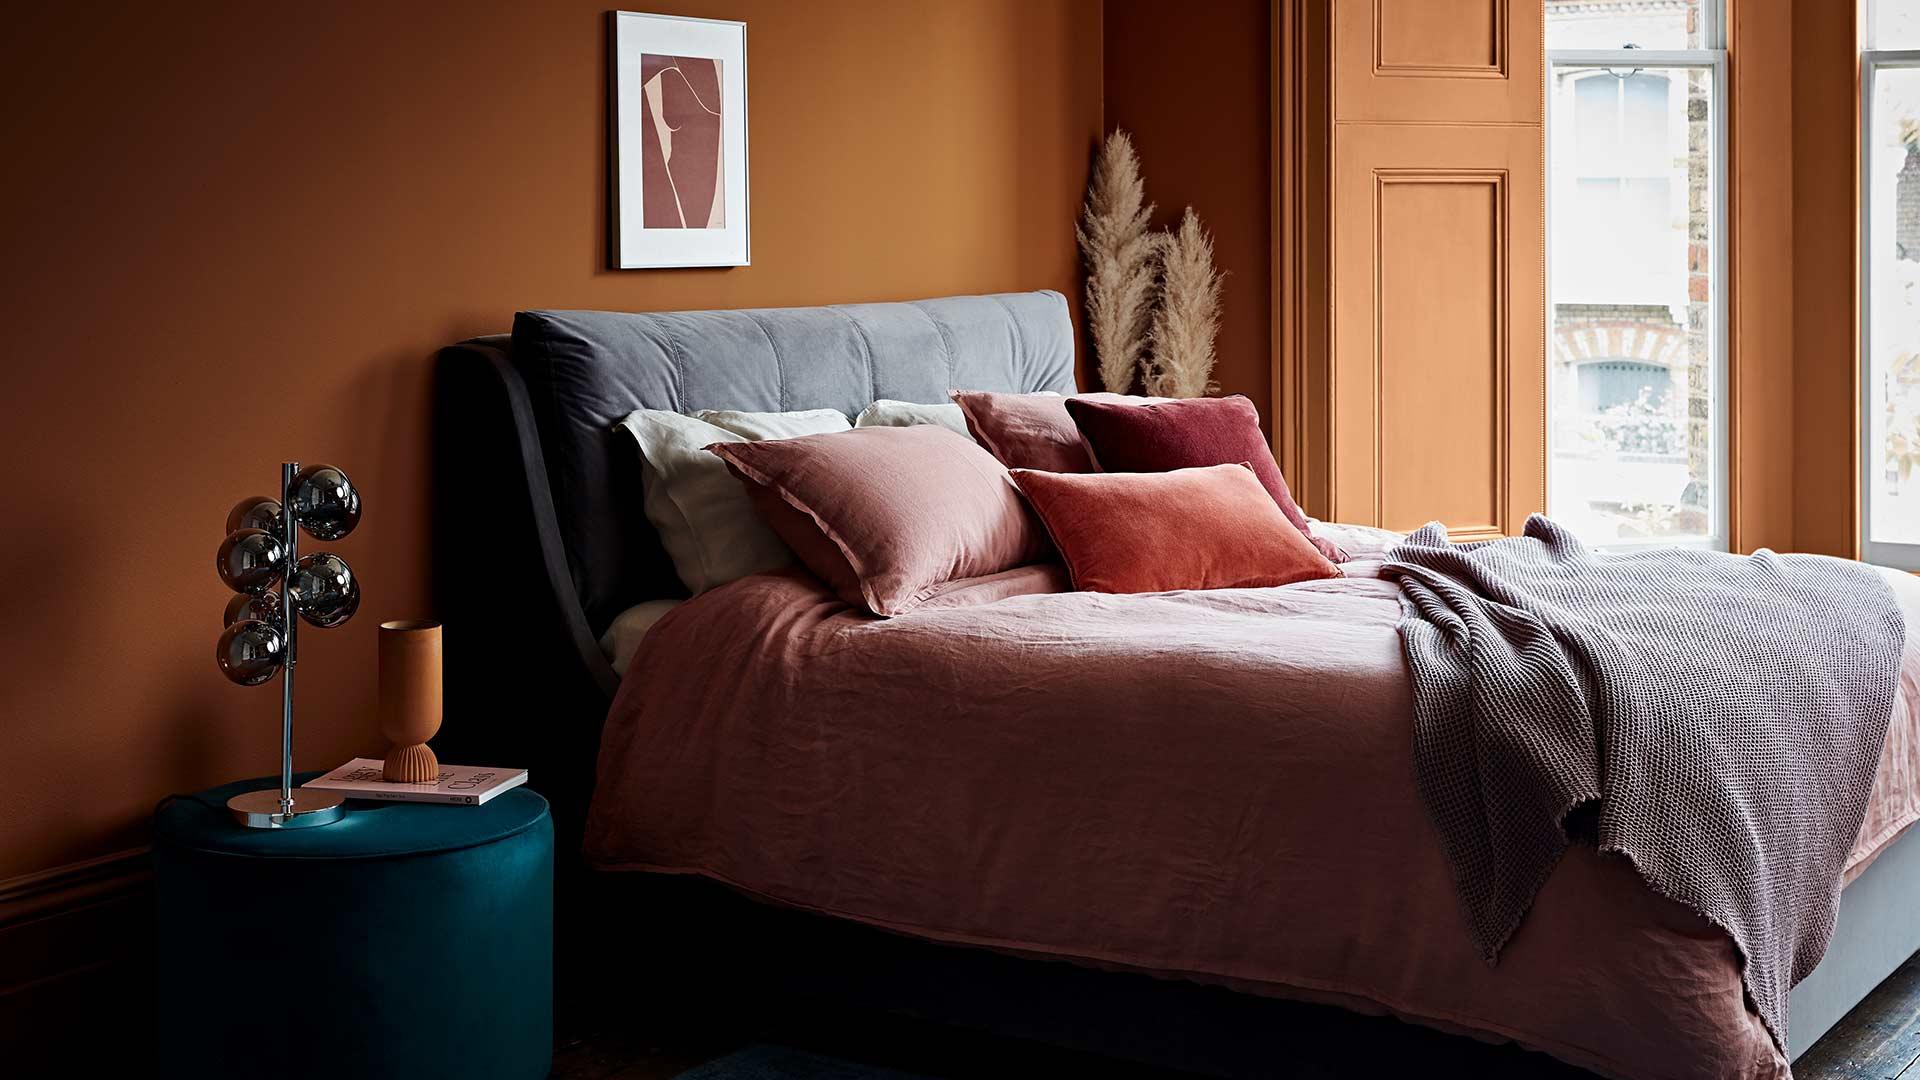 Bedroom Interior Style Orange Walls Stylist Lucy Gough